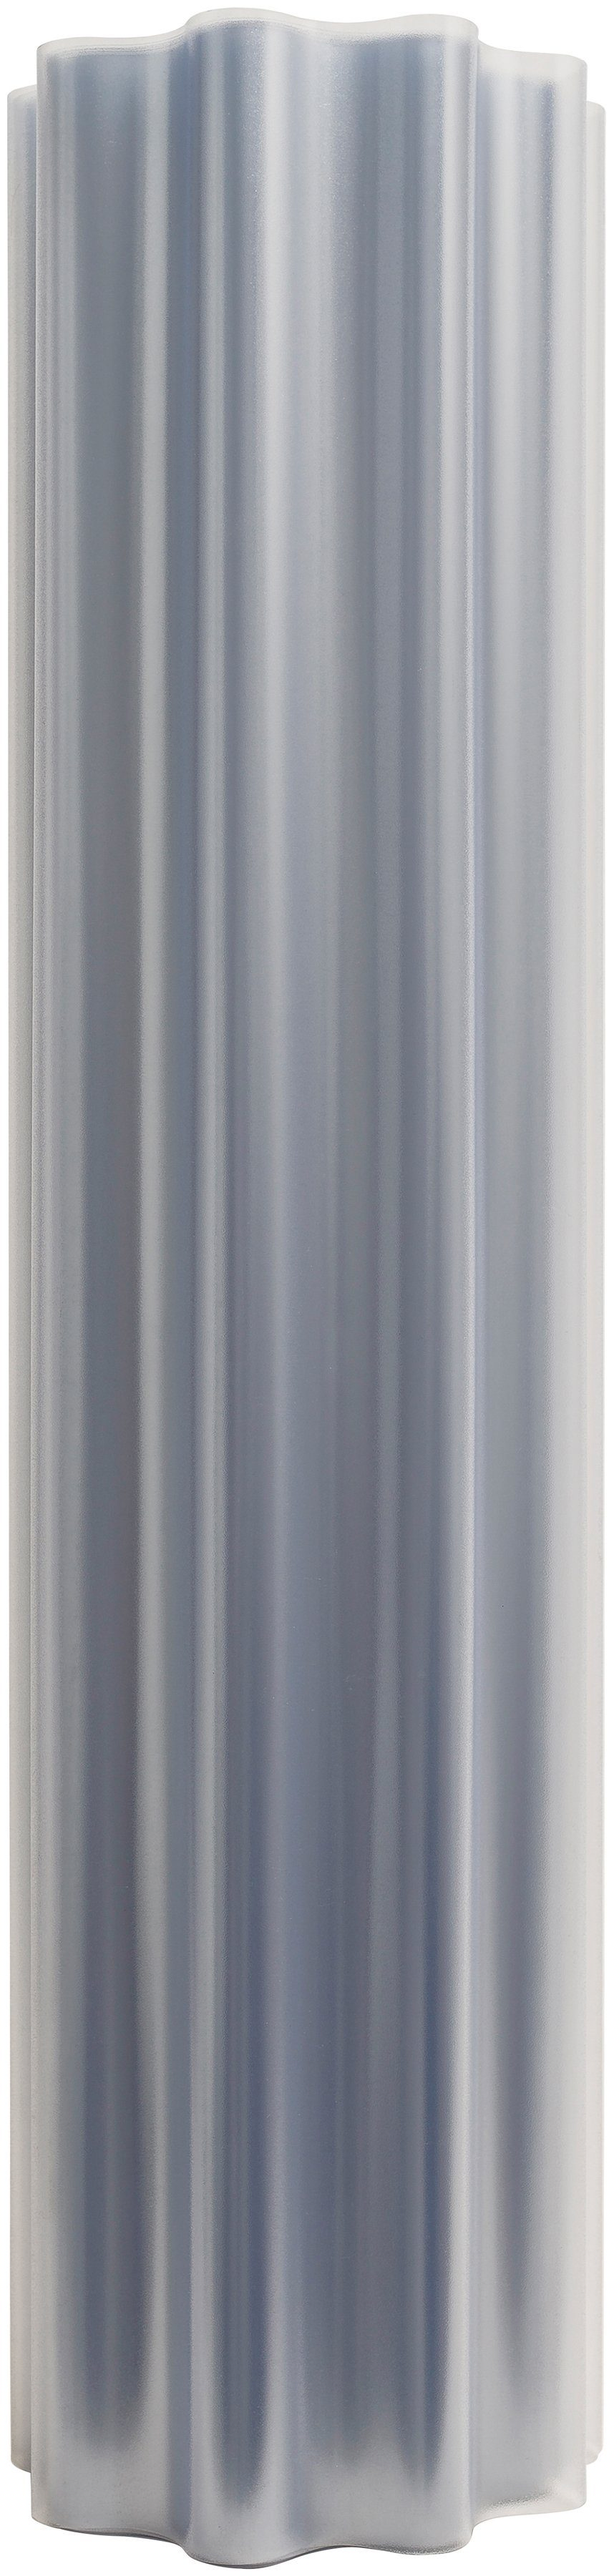 Wellplatte »Rolle HR sinus«, klar, 10 m², inkl. Befestigung